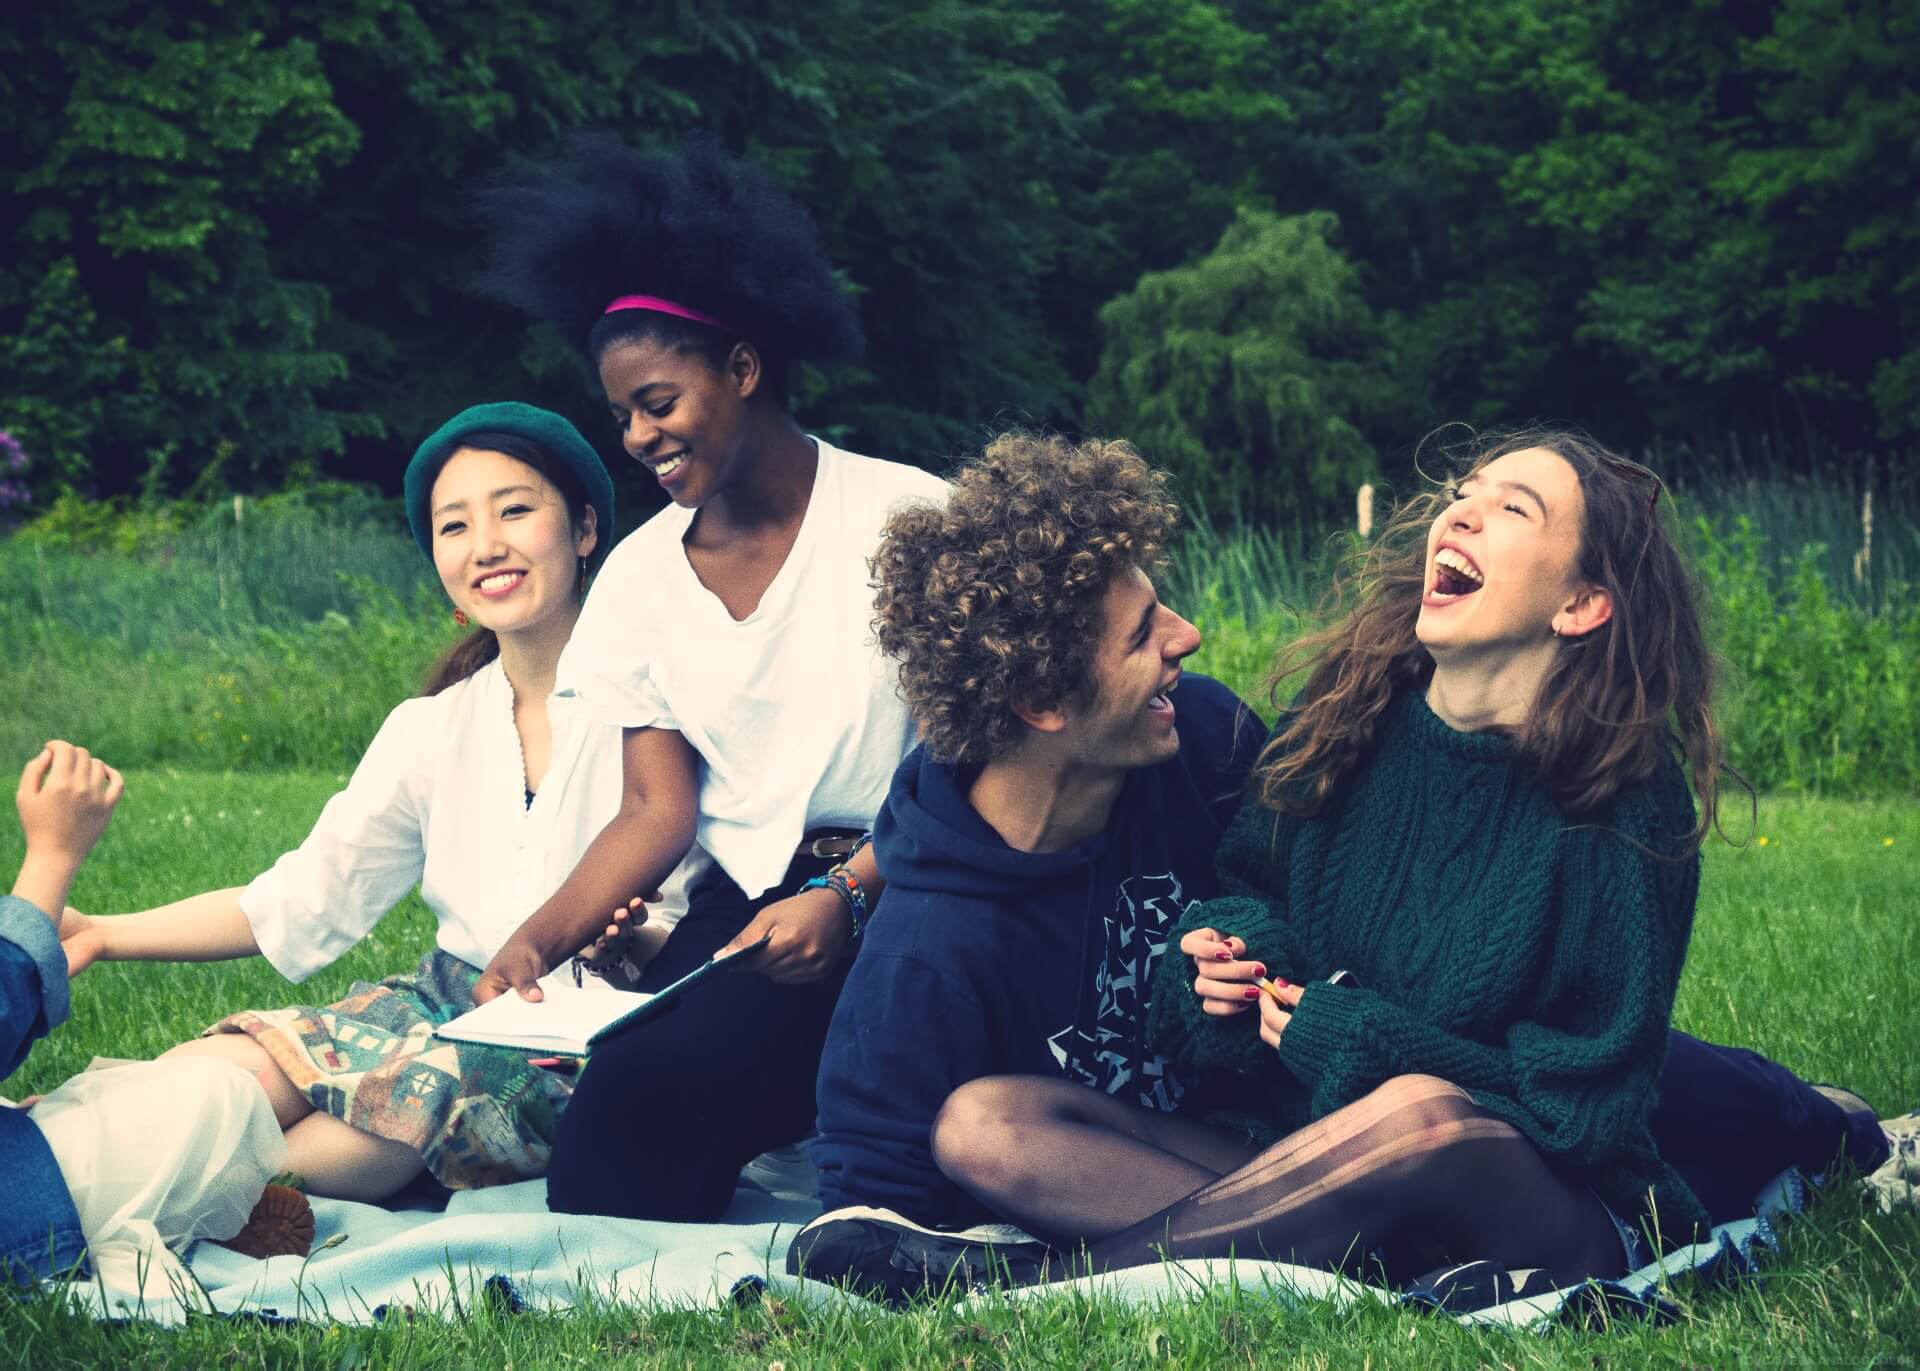 IPC - Folk High School Students hanging out - International People's College - a Folk High School in Denmark